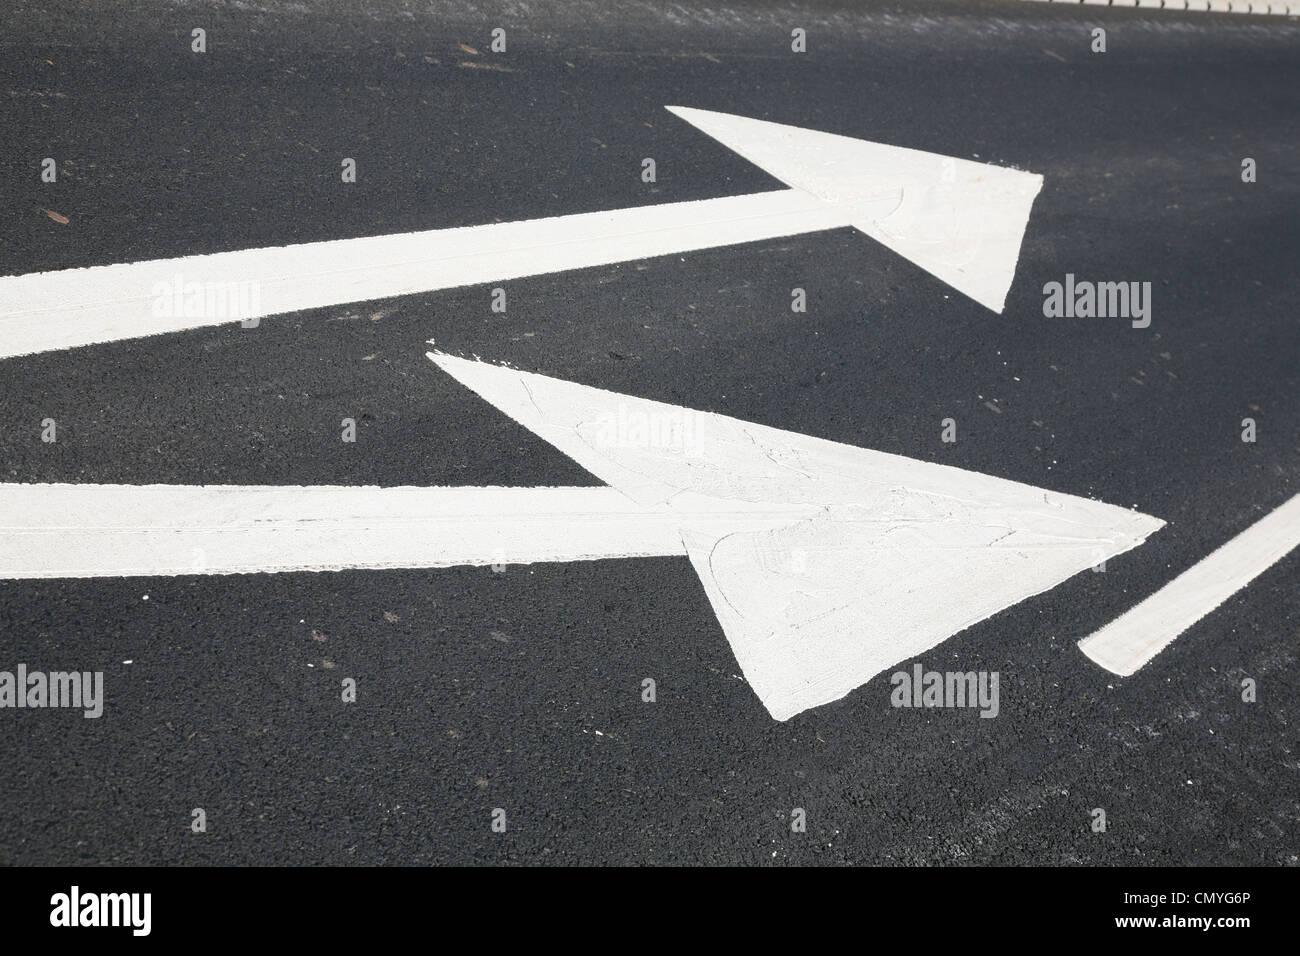 new road markings - Stock Image